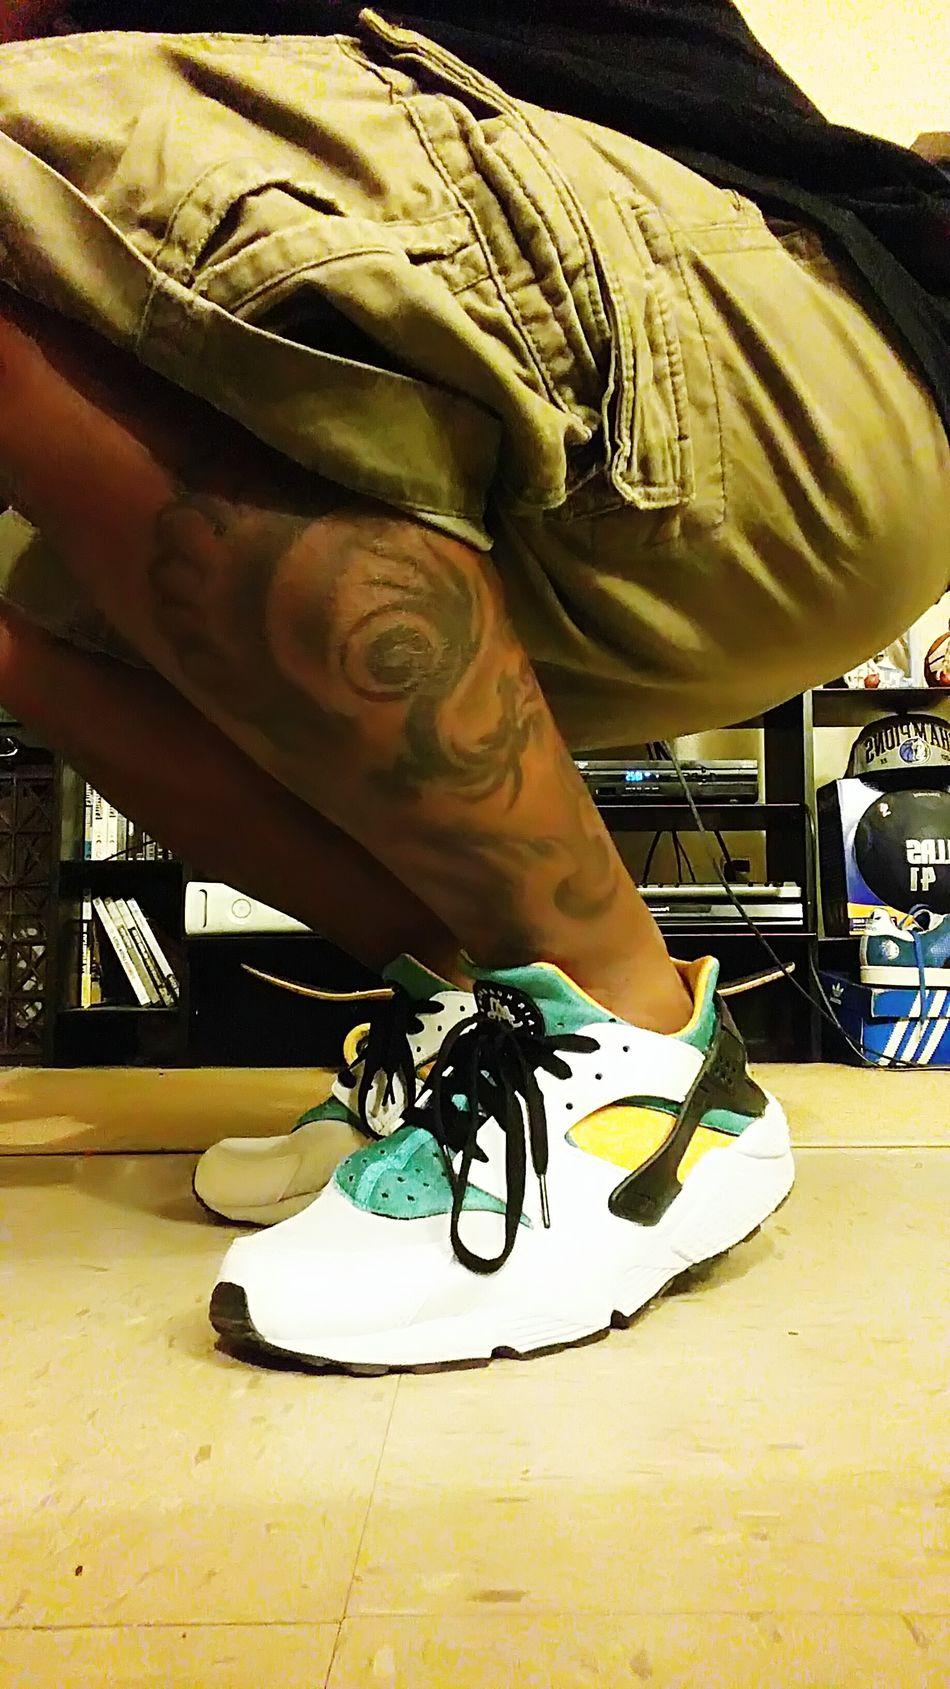 That's Me Colorful Brooklyn Tattoos Huarache Fashion Nike Nikeairhuarache. Legtattoos